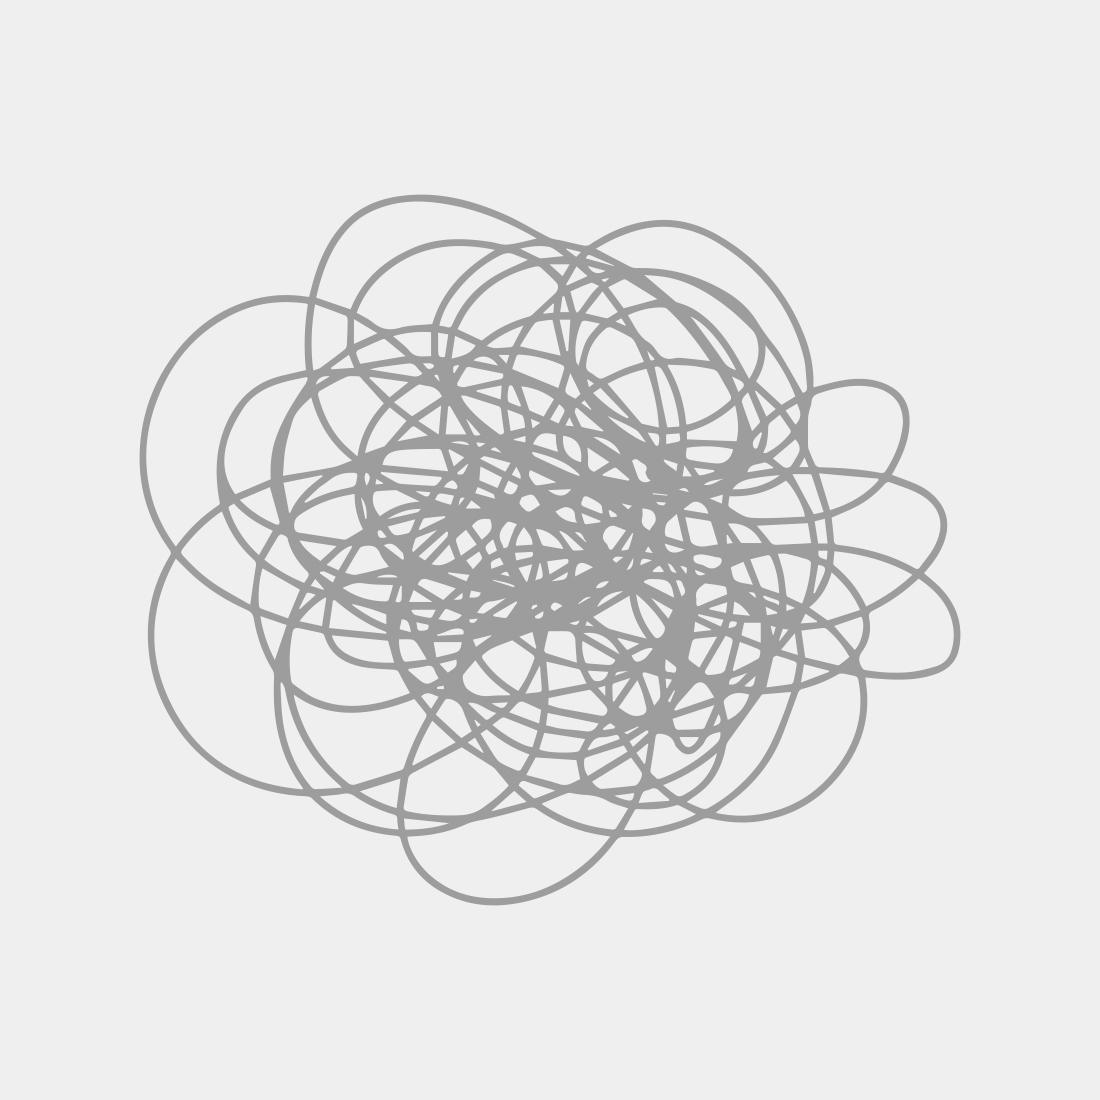 Barbara Rae : Sketchbooks Limited Edition